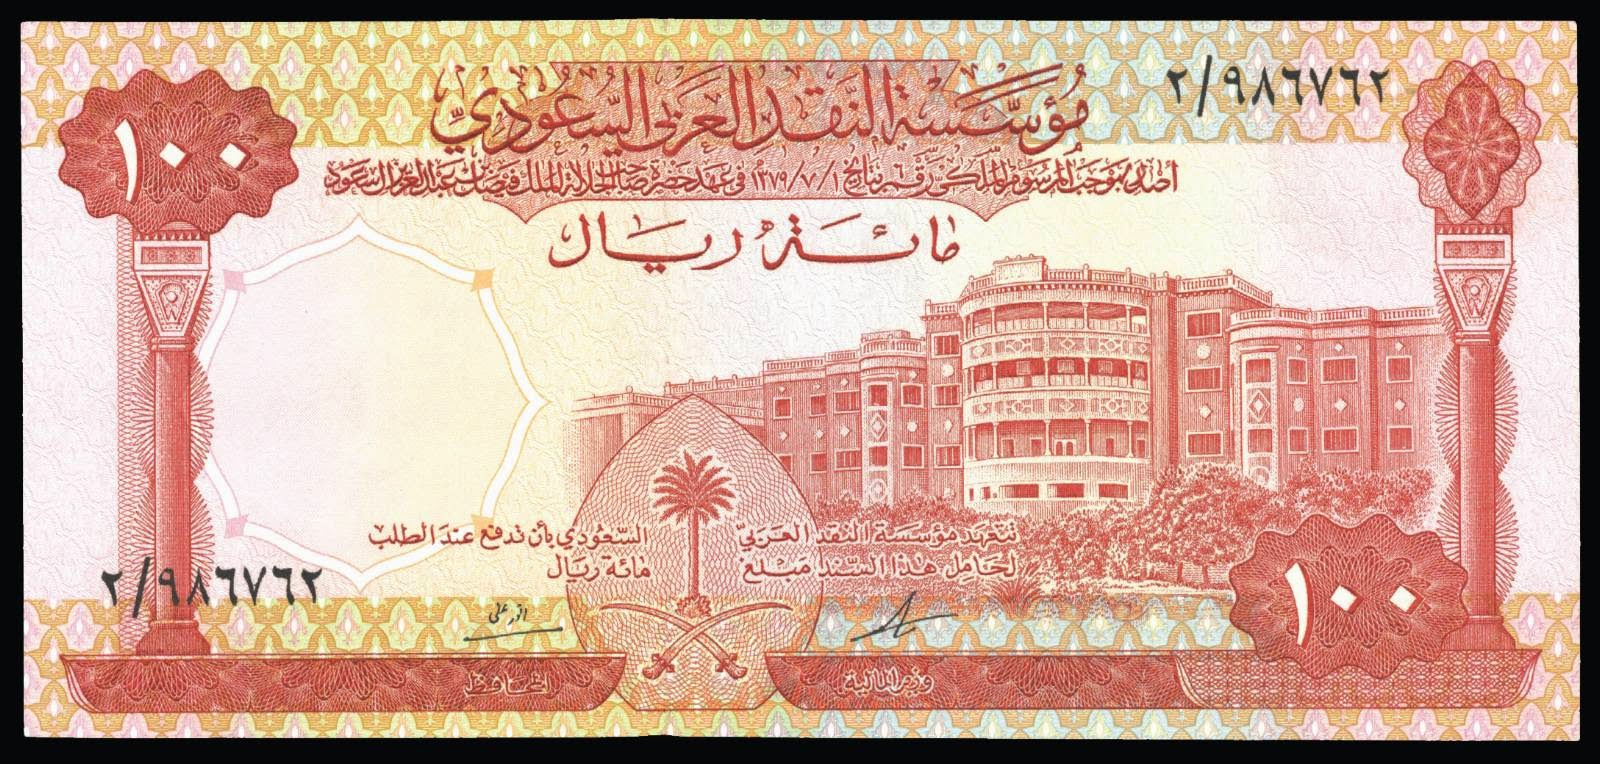 Saudi Arabia banknotes 100 Saudi Riyals note 1968